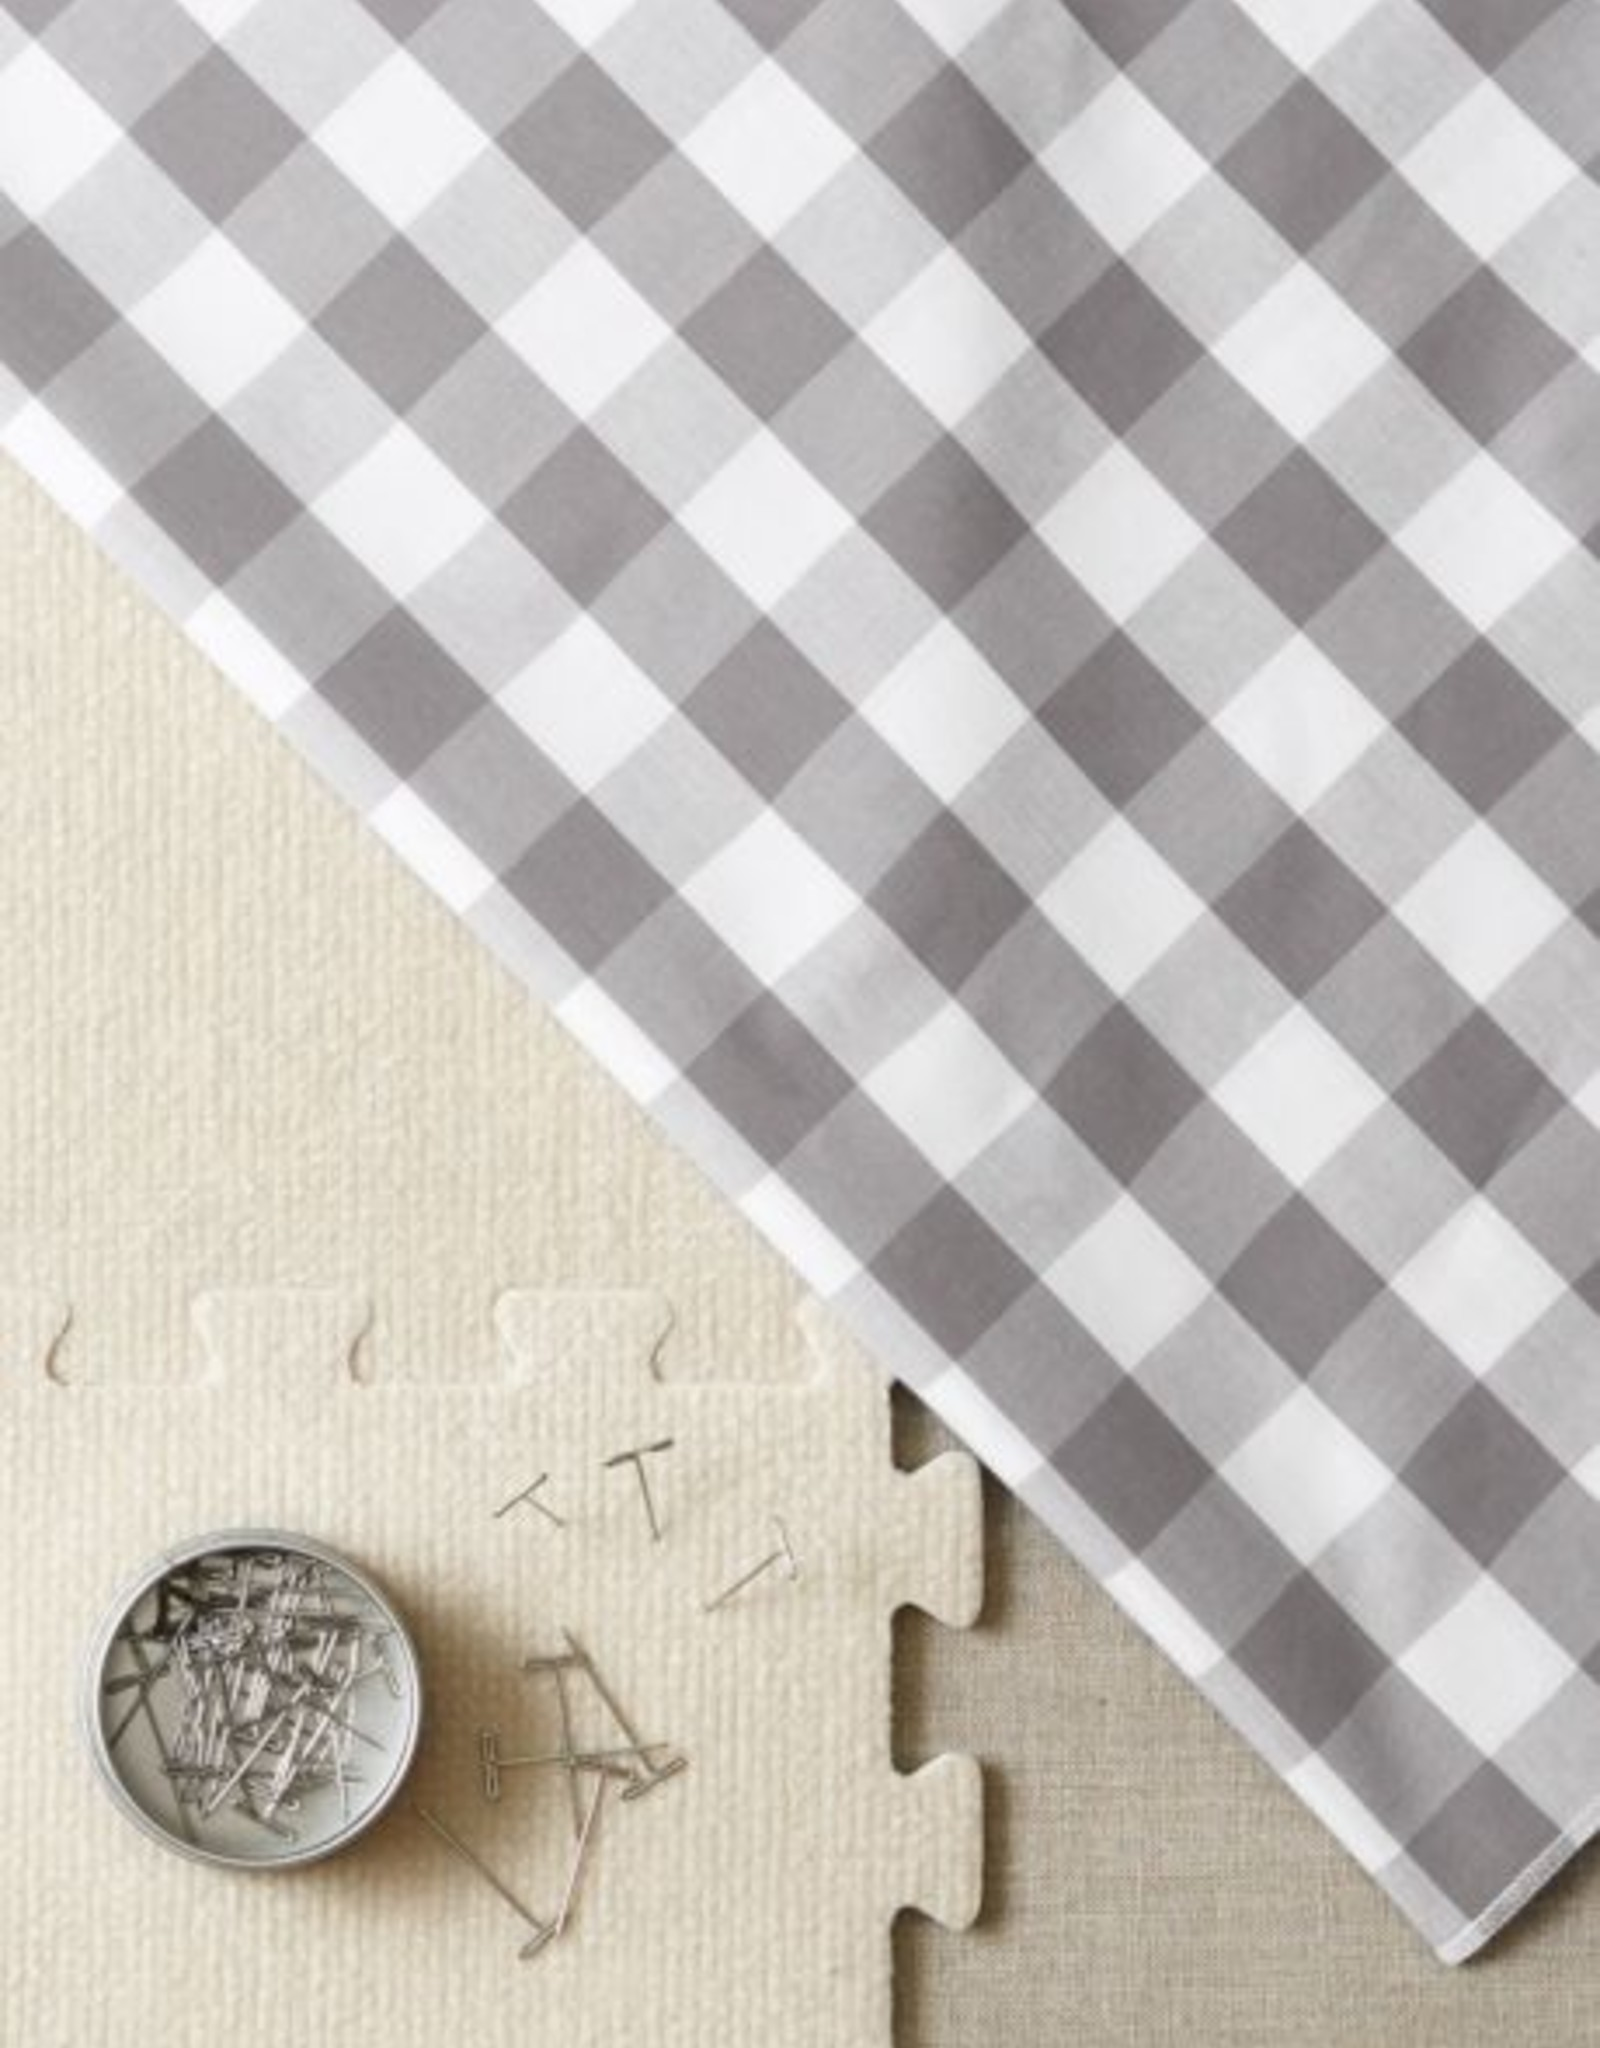 Cocoknits Cocoknits Knitter's Block Kit